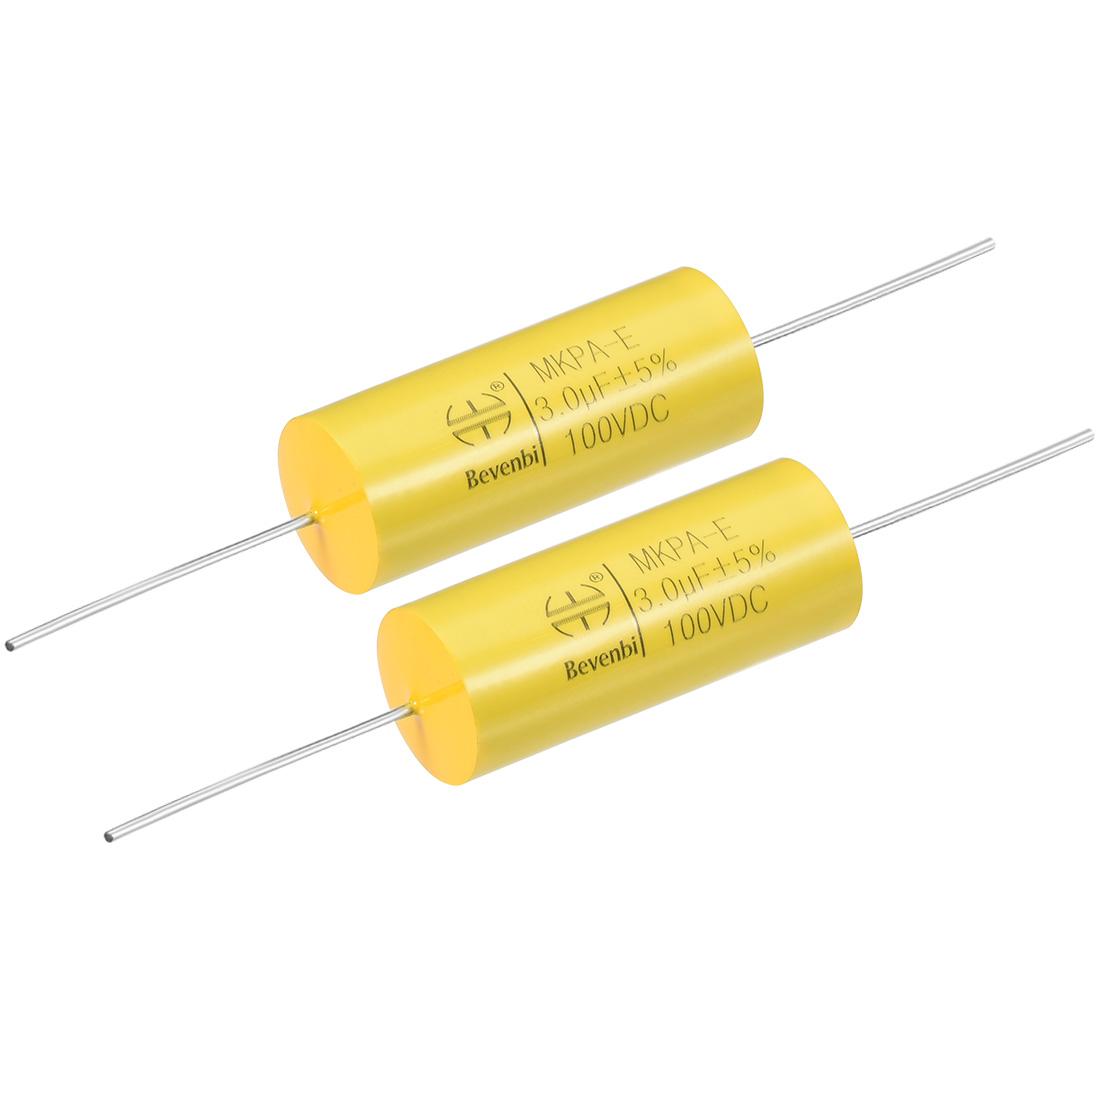 Film Capacitor 100V DC 3.0uF MKPA-E Round Polypropylene Capacitors Yellow 2pcs